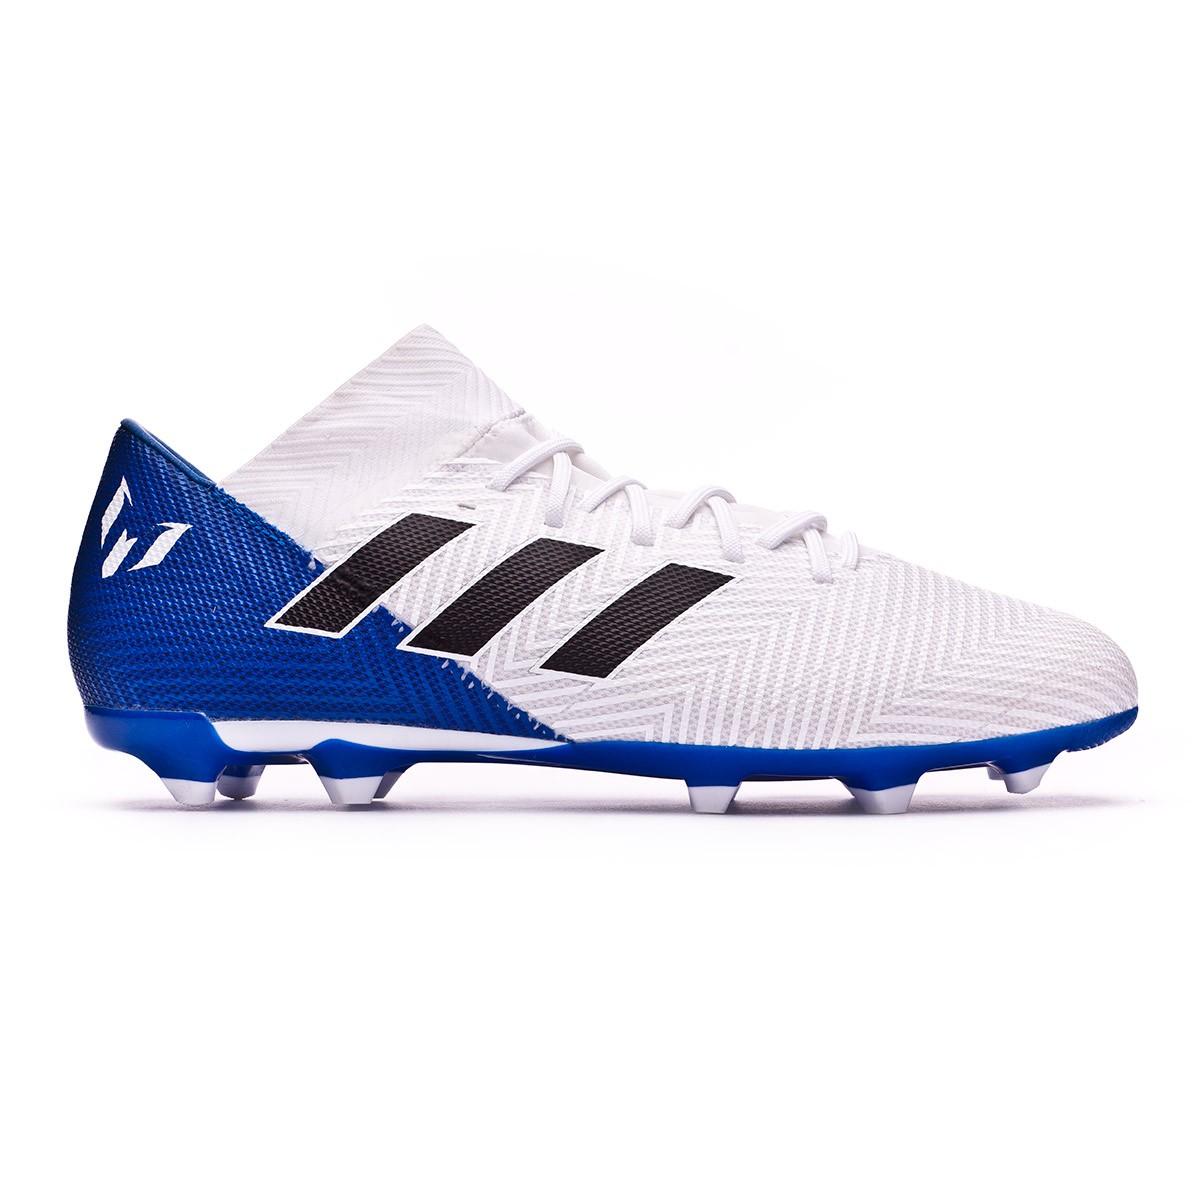 66cec18c98f4 Boot adidas Nemeziz Messi 18.3 FG White-Core black-Football blue - Leaked  soccer